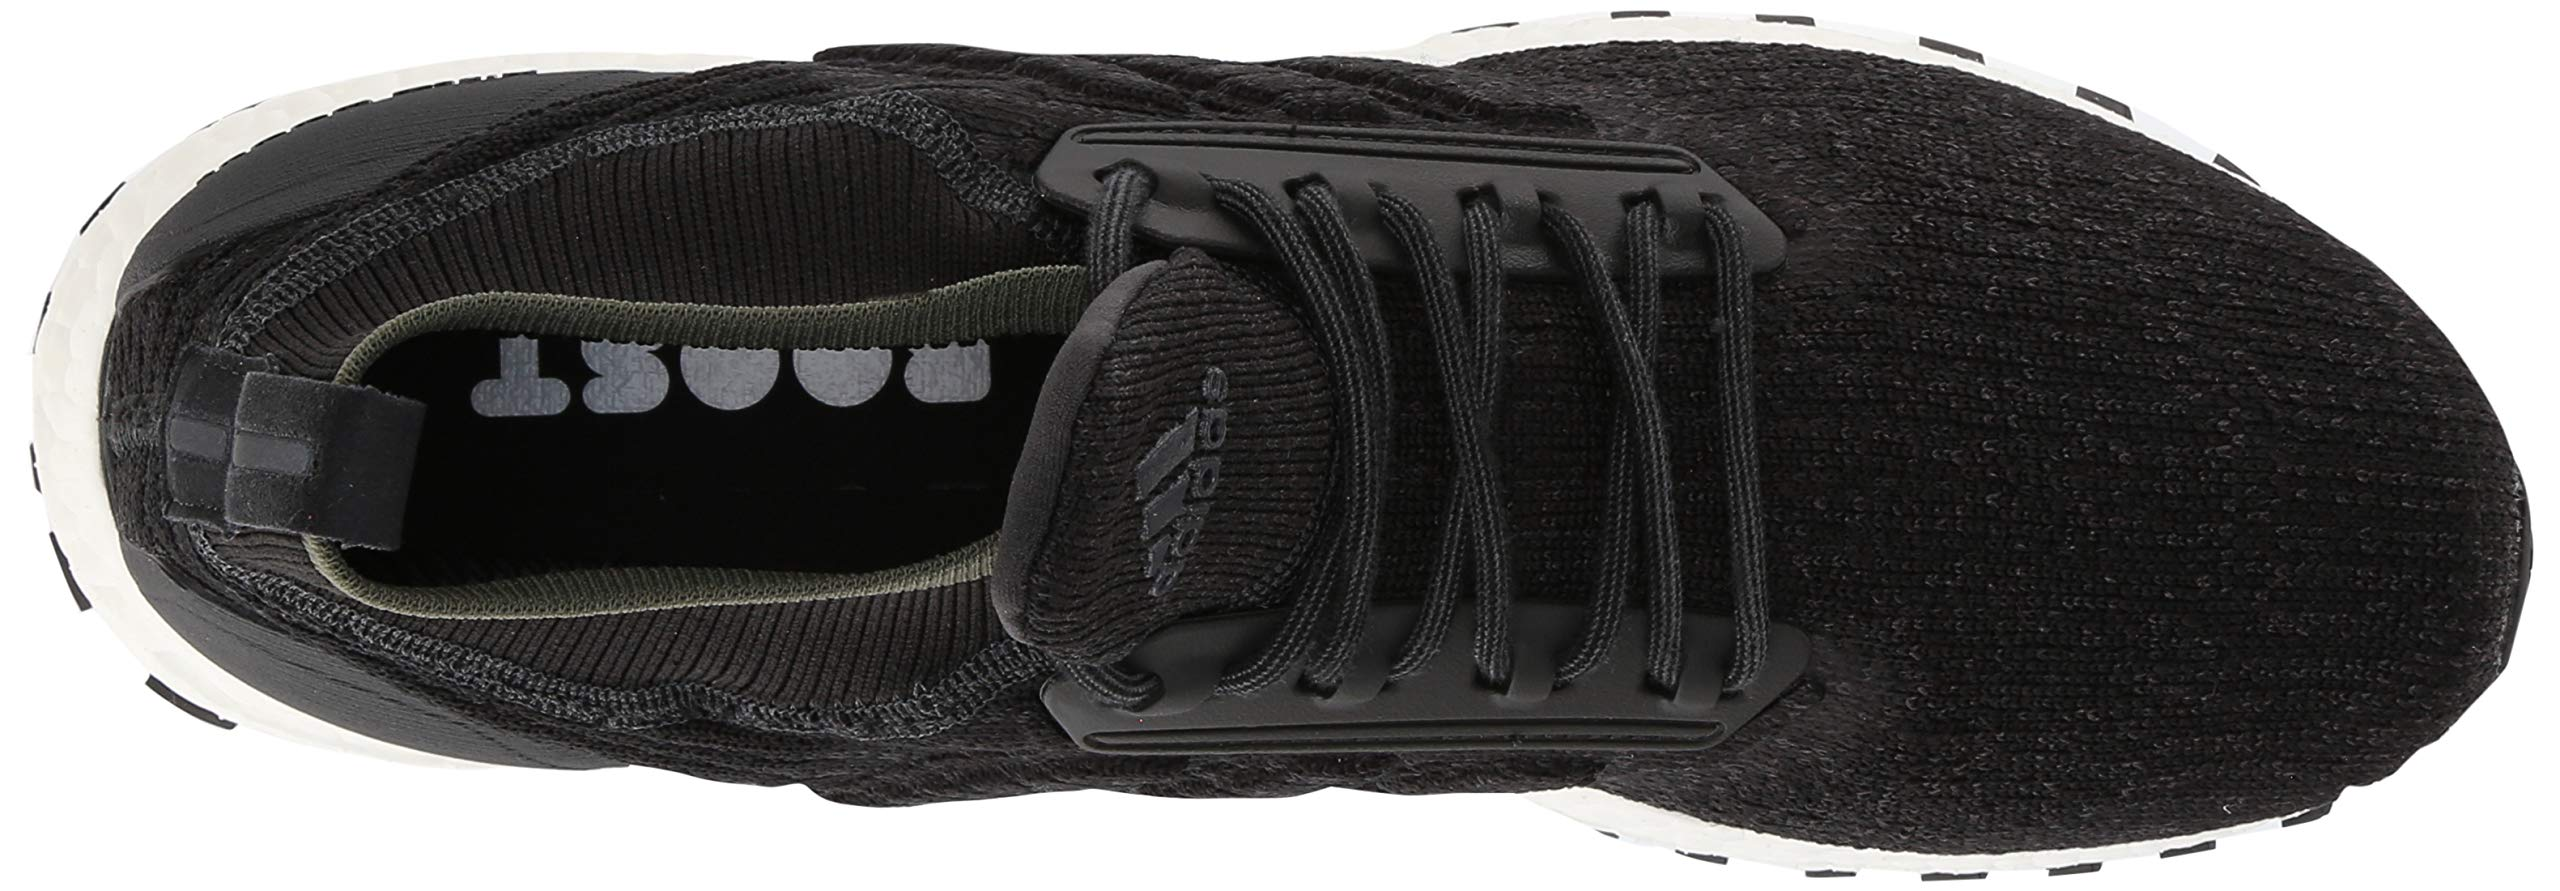 71IinvBiyGL - adidas Men's Ultraboost All Terrain Running Shoe